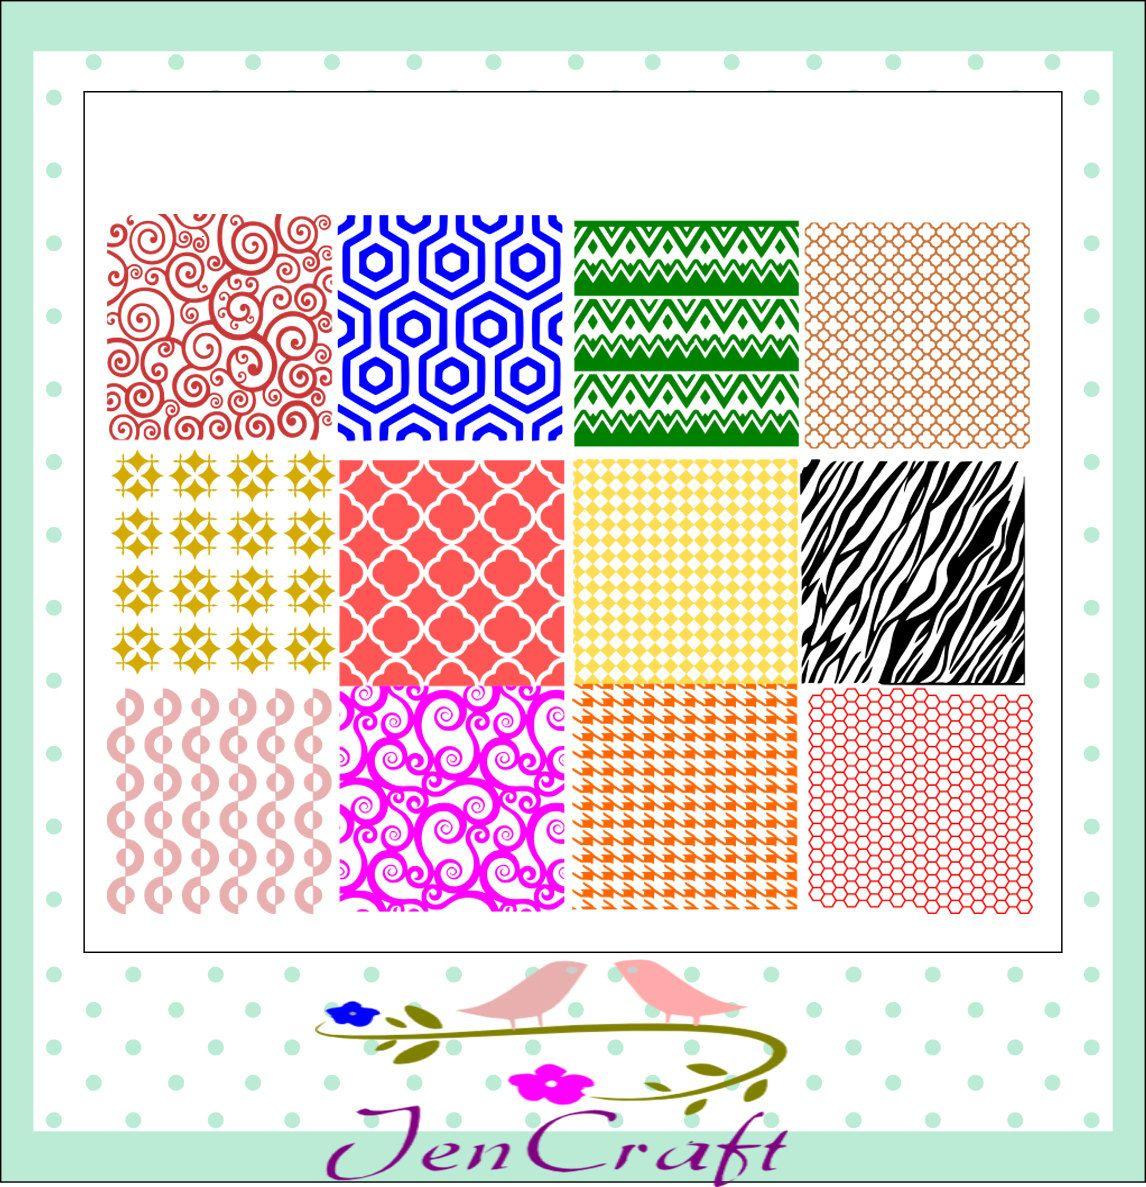 Background Patterns Svg, PNG, EPS, Dxf Files, Design Space